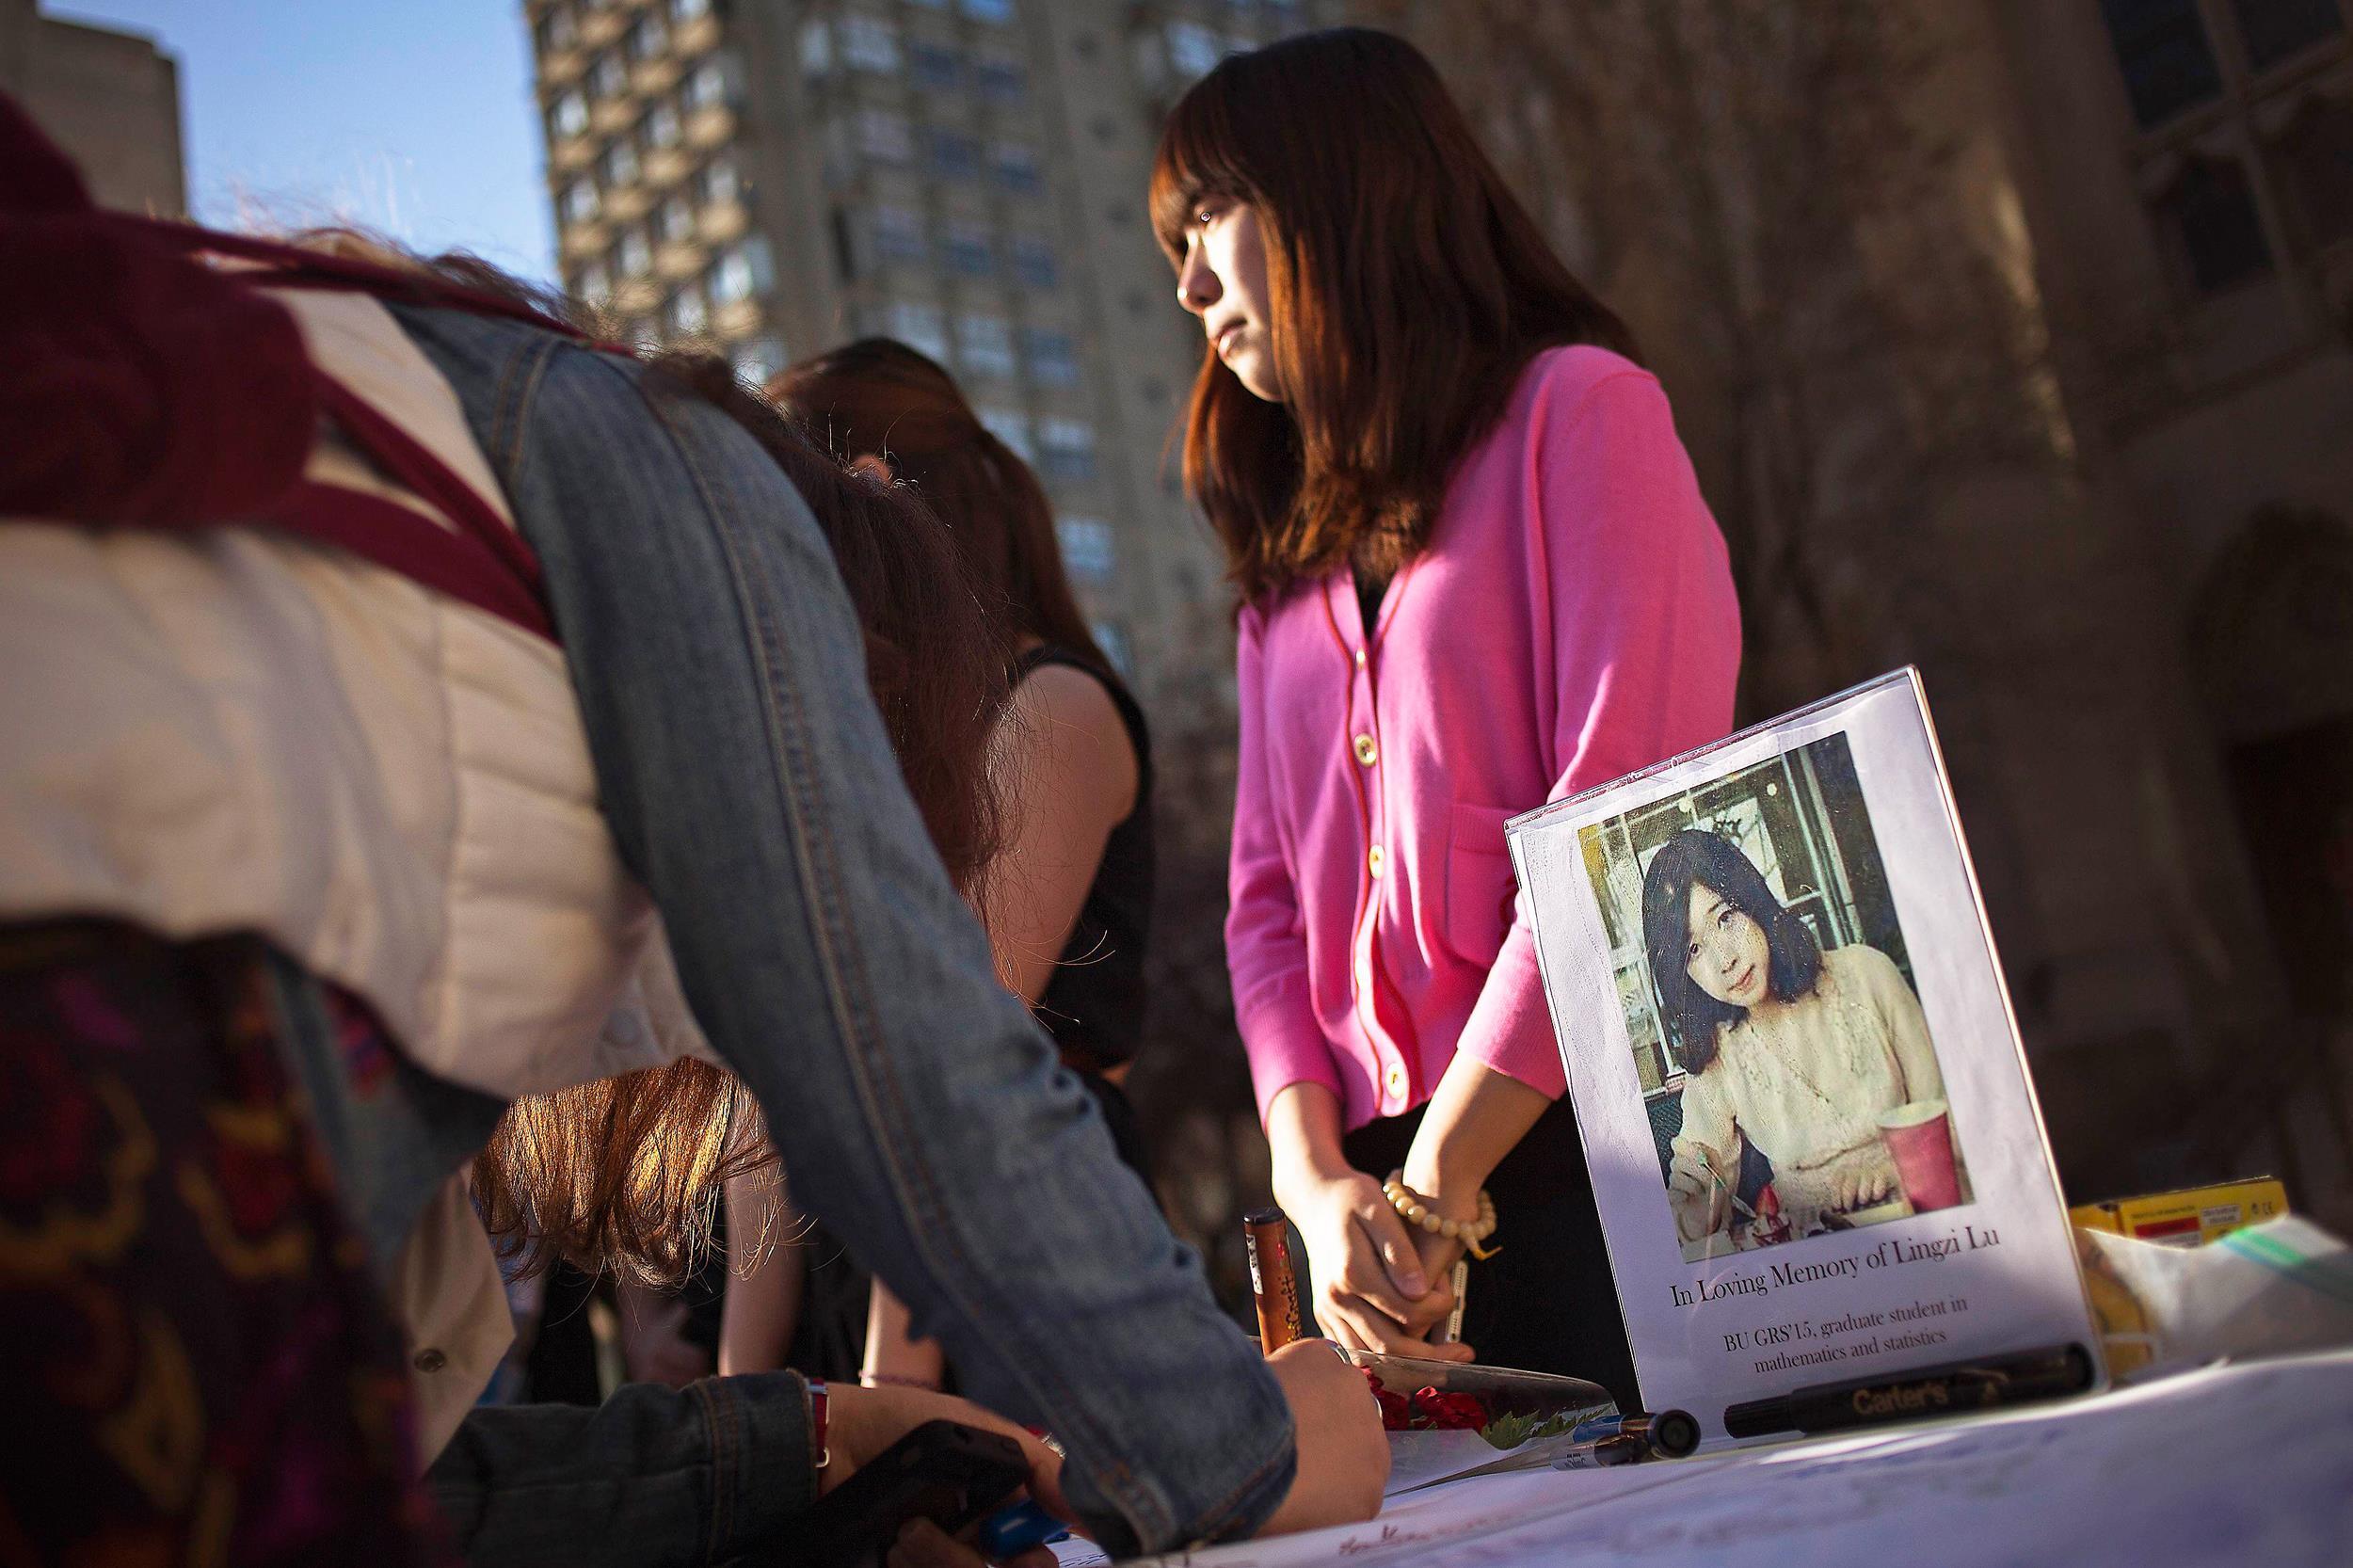 Image: A photo of Boston Marathon bombing victim Lu is seen outside the Boston University Marsh Chapel in Massachusetts